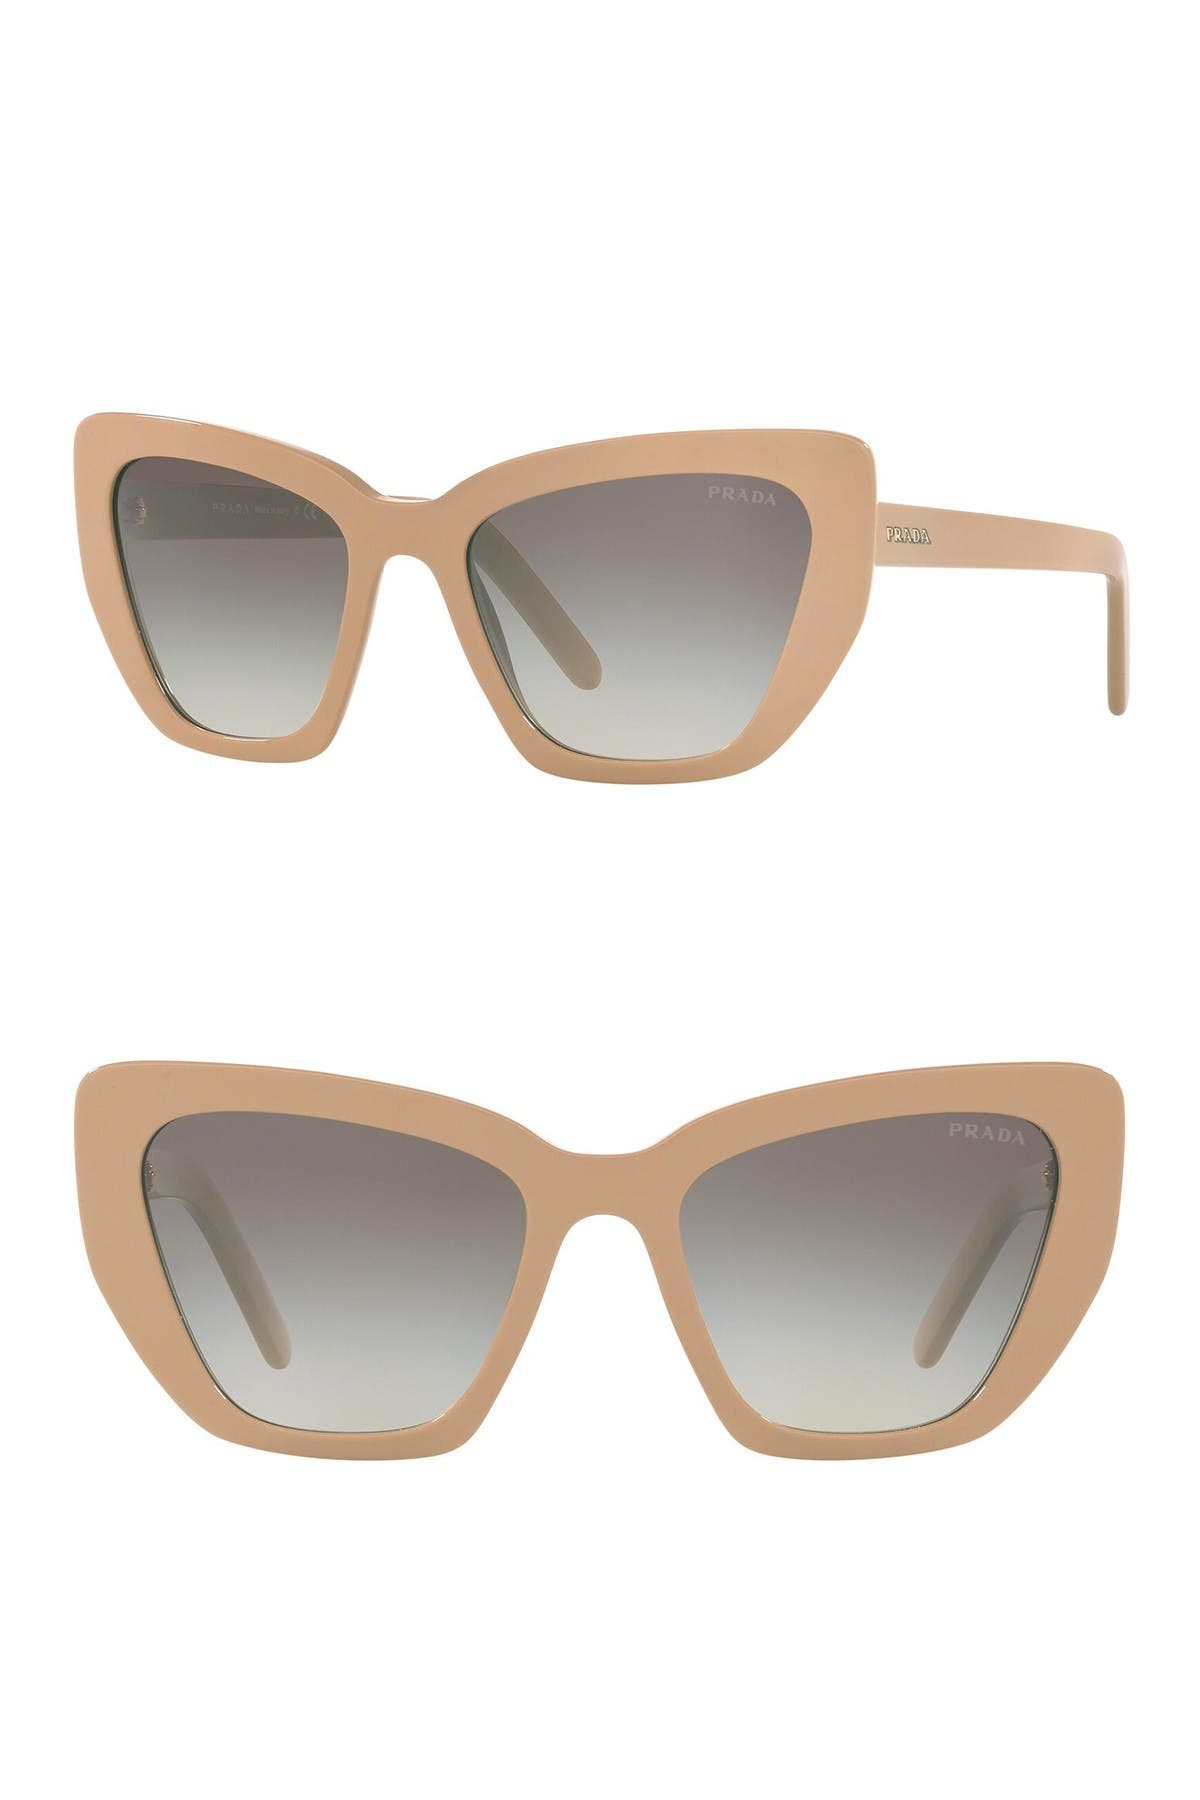 Image of Prada 55mm Cat Eye Sunglasses